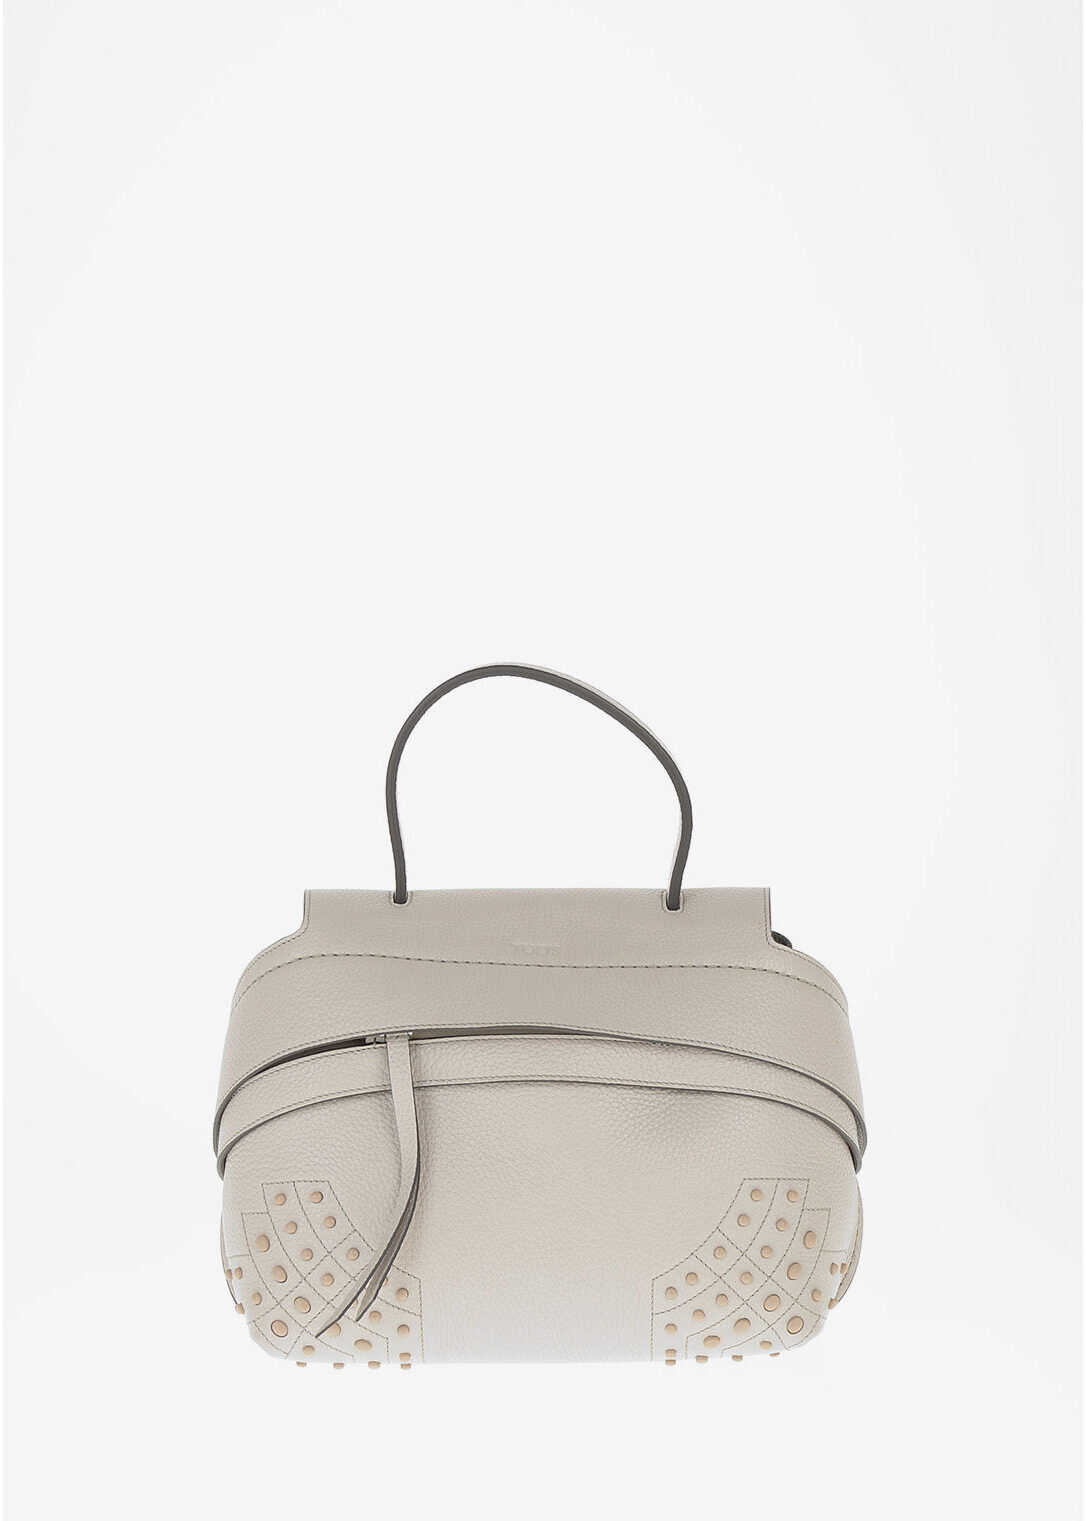 TOD'S Leather GOMMINI Shoulder Bag GRAY imagine b-mall.ro